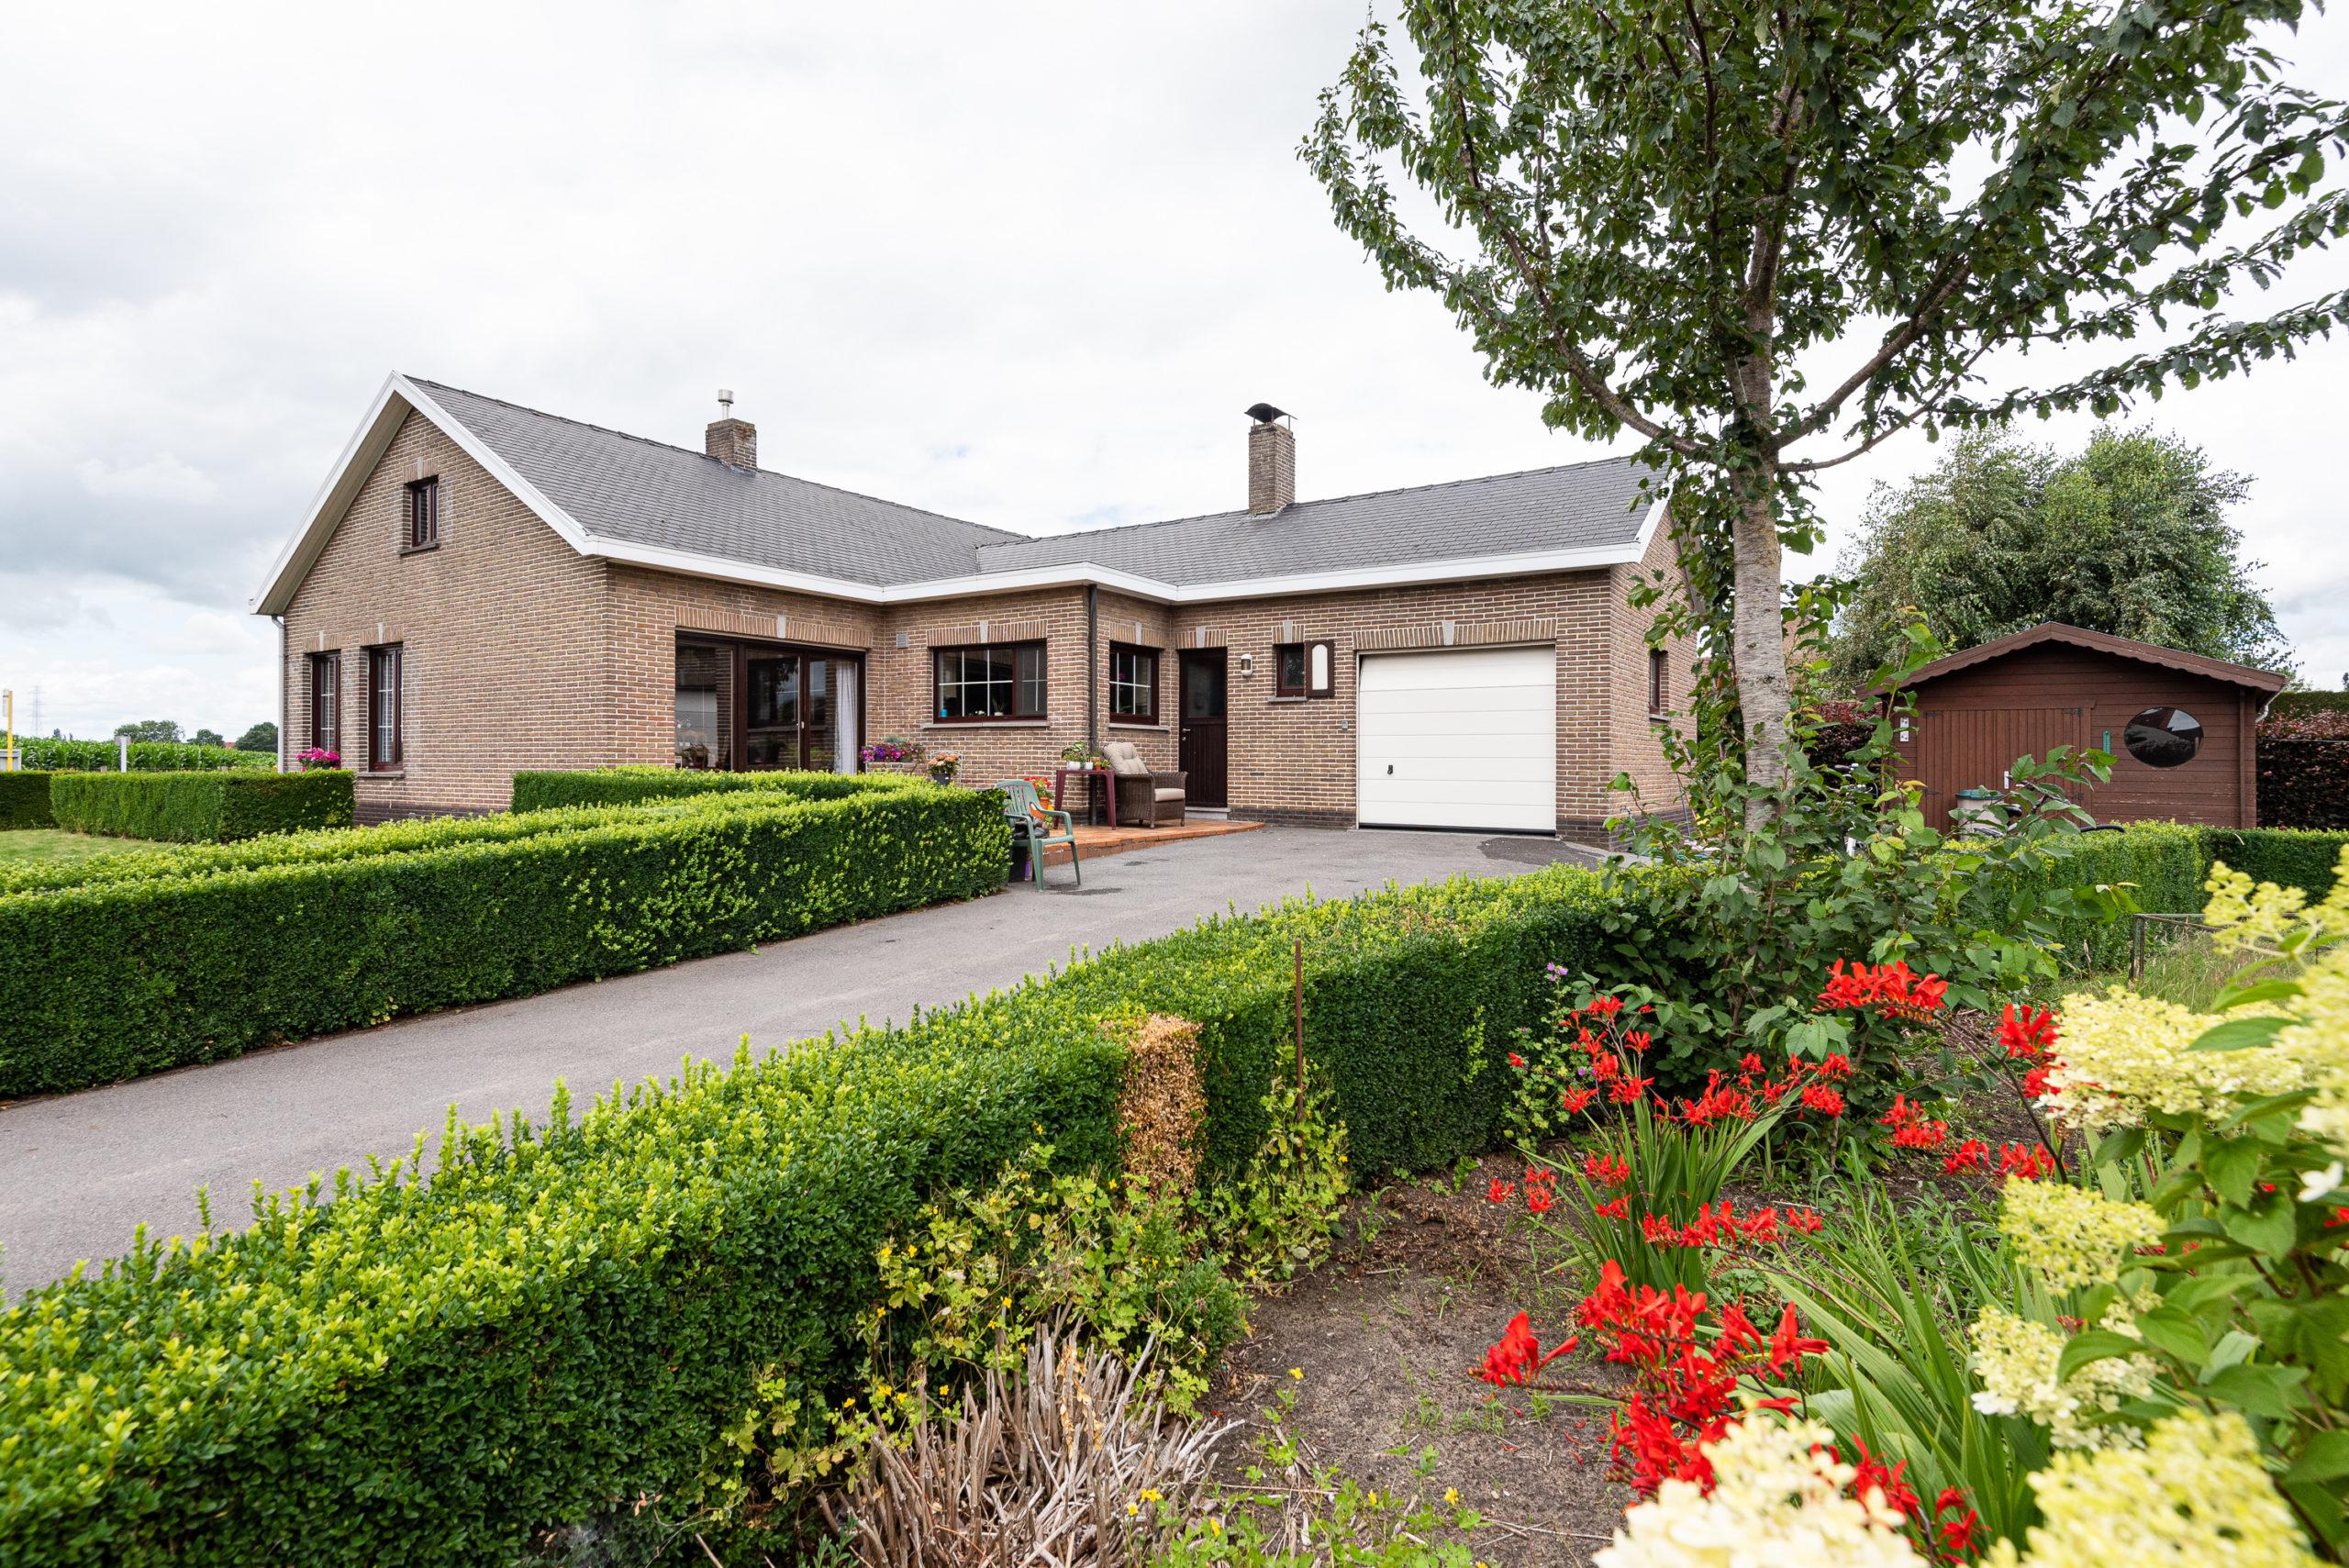 Ruime bungalow met grote tuin